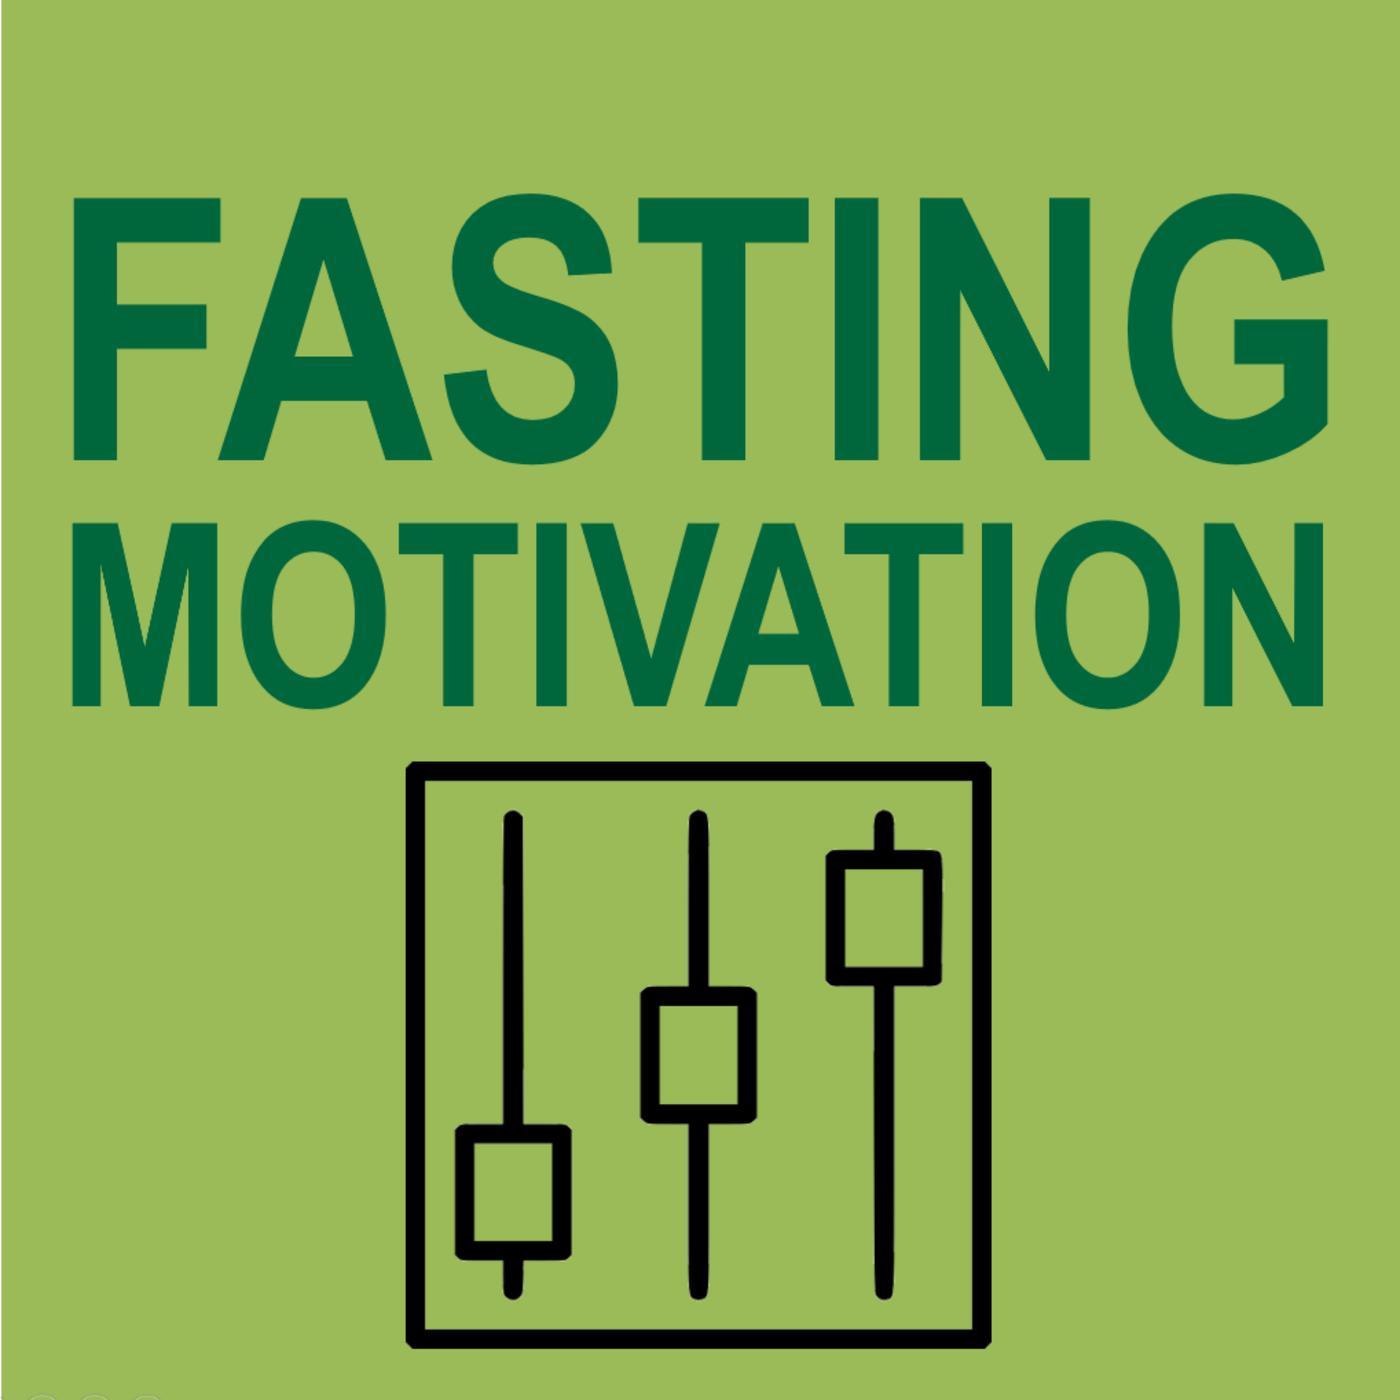 Fasting Motivation Minute (podcast) - Fasting Motivation